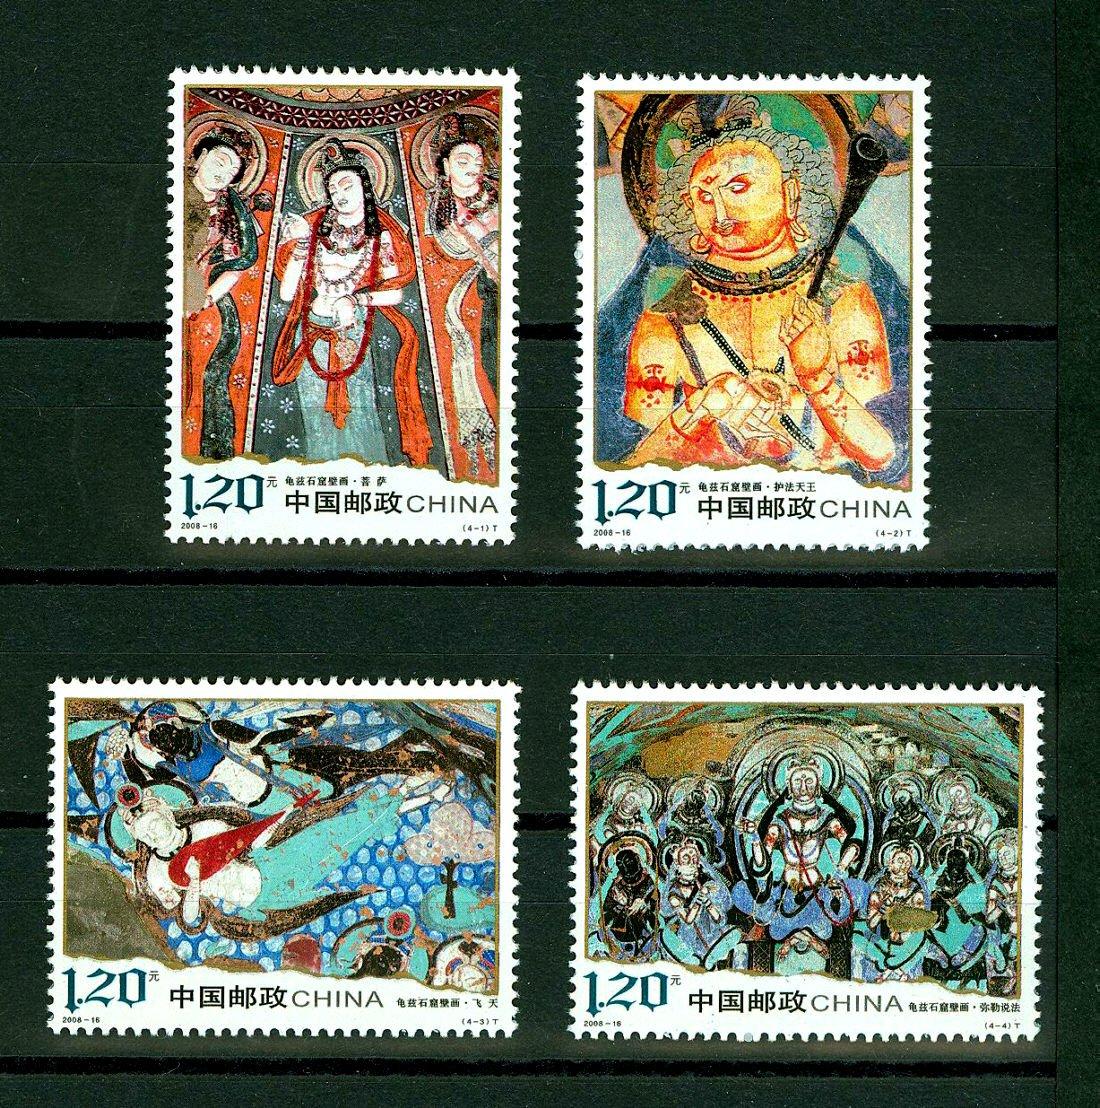 China Qiuci Grotto Murals 4 stamps mnh 2008